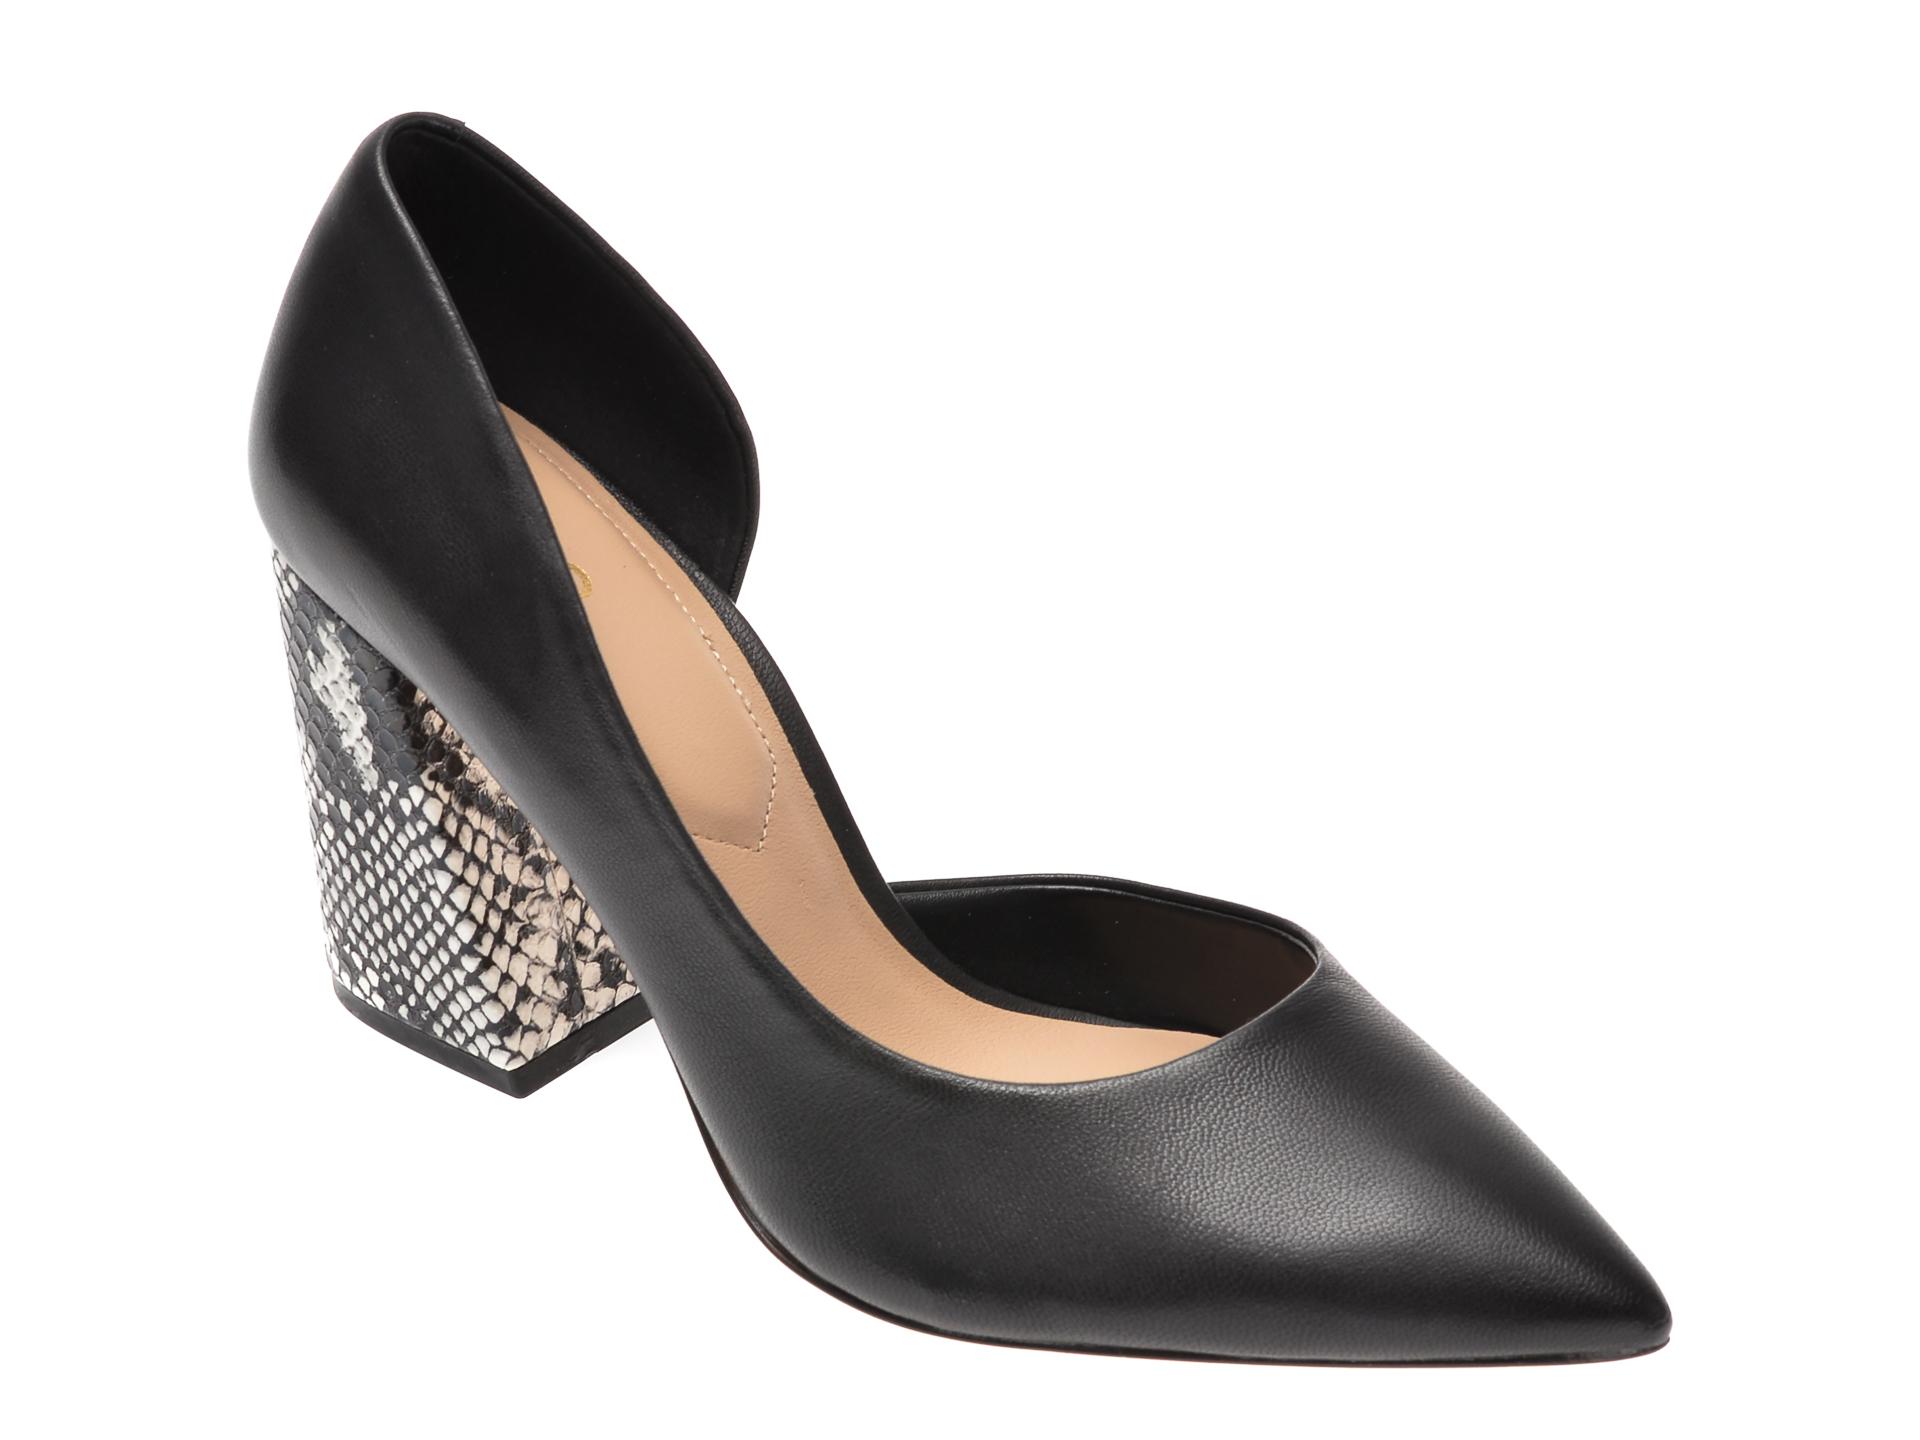 Pantofi ALDO negri, Ushari001, din piele ecologica imagine otter.ro 2021